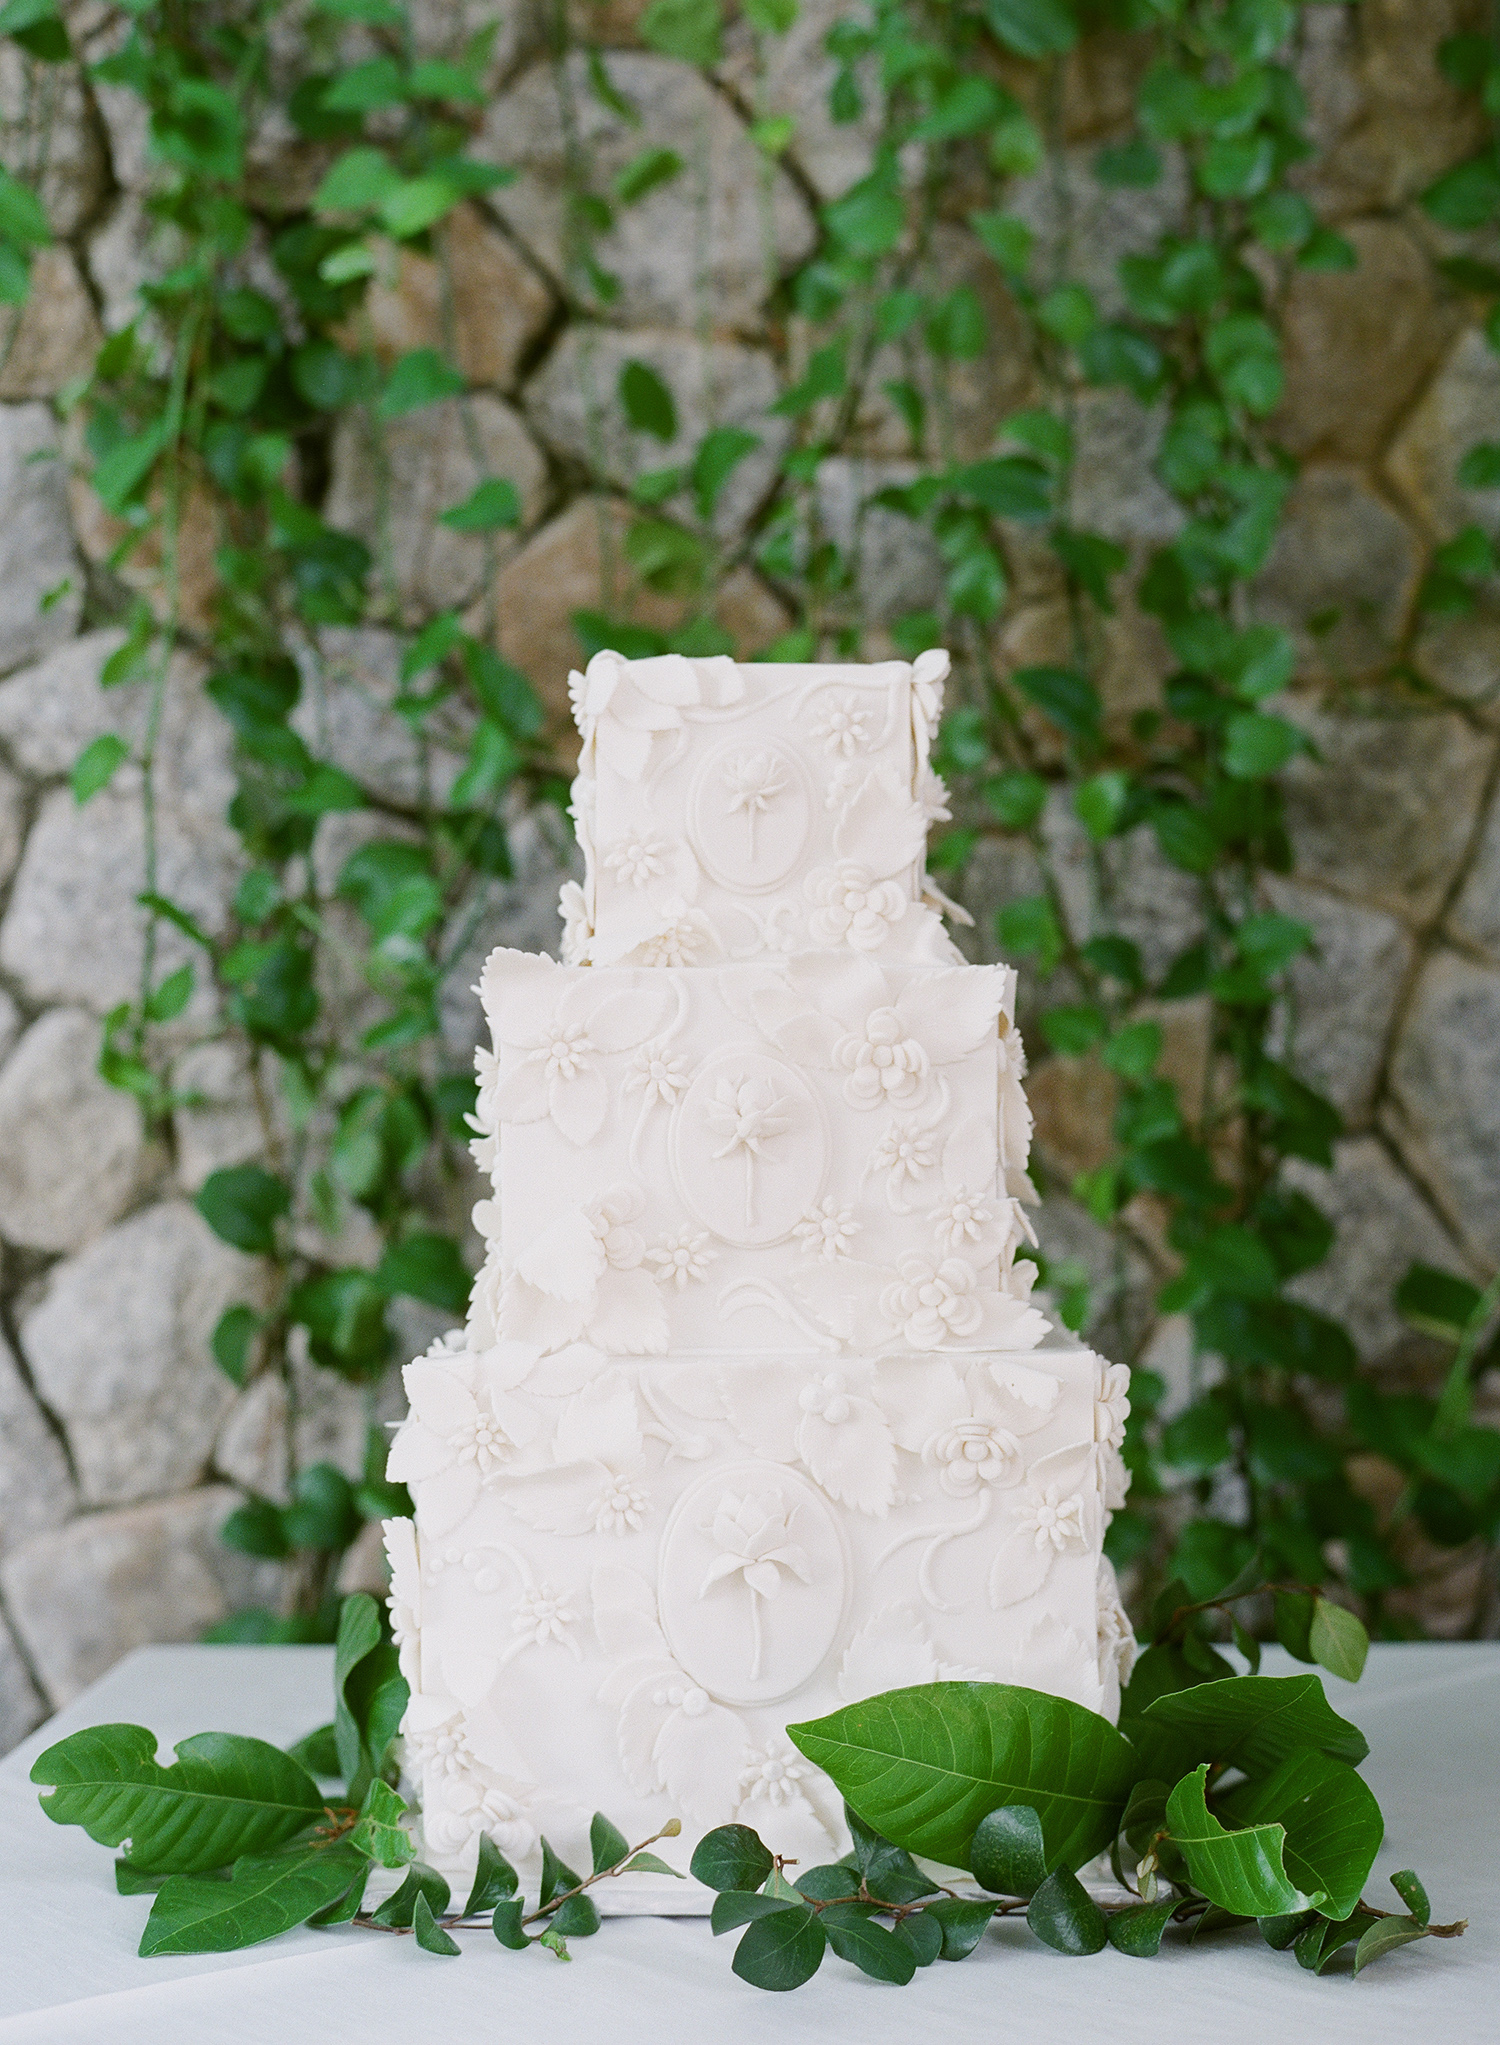 stacy brad wedding thailand white cake